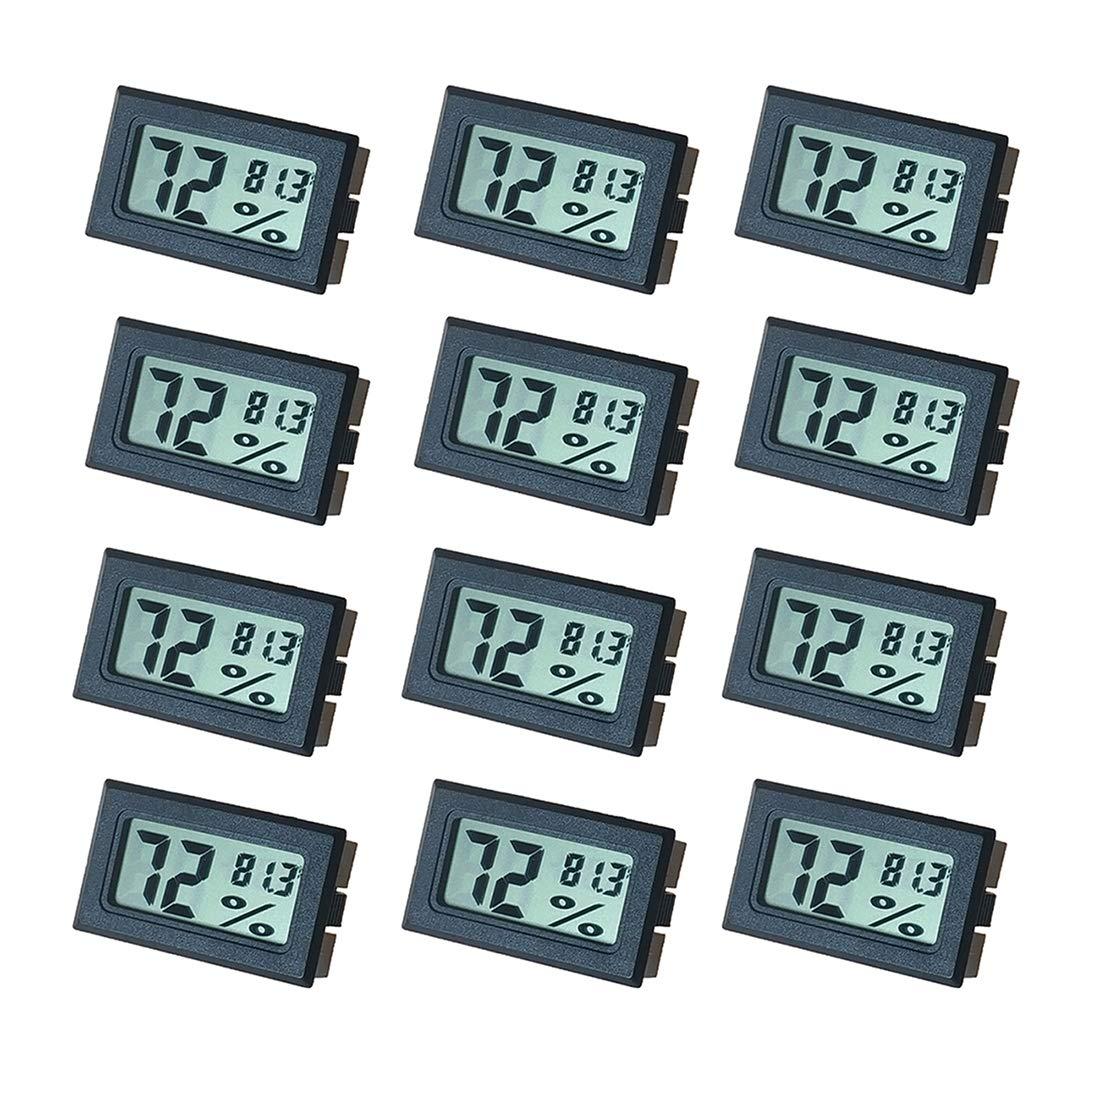 Newlight66 Humidity Gauge, Digital Hygrometer Indoor Outdoor Hygrometer Thermometer (°F) for Humidors Home Car Greenhouse(12 Pack